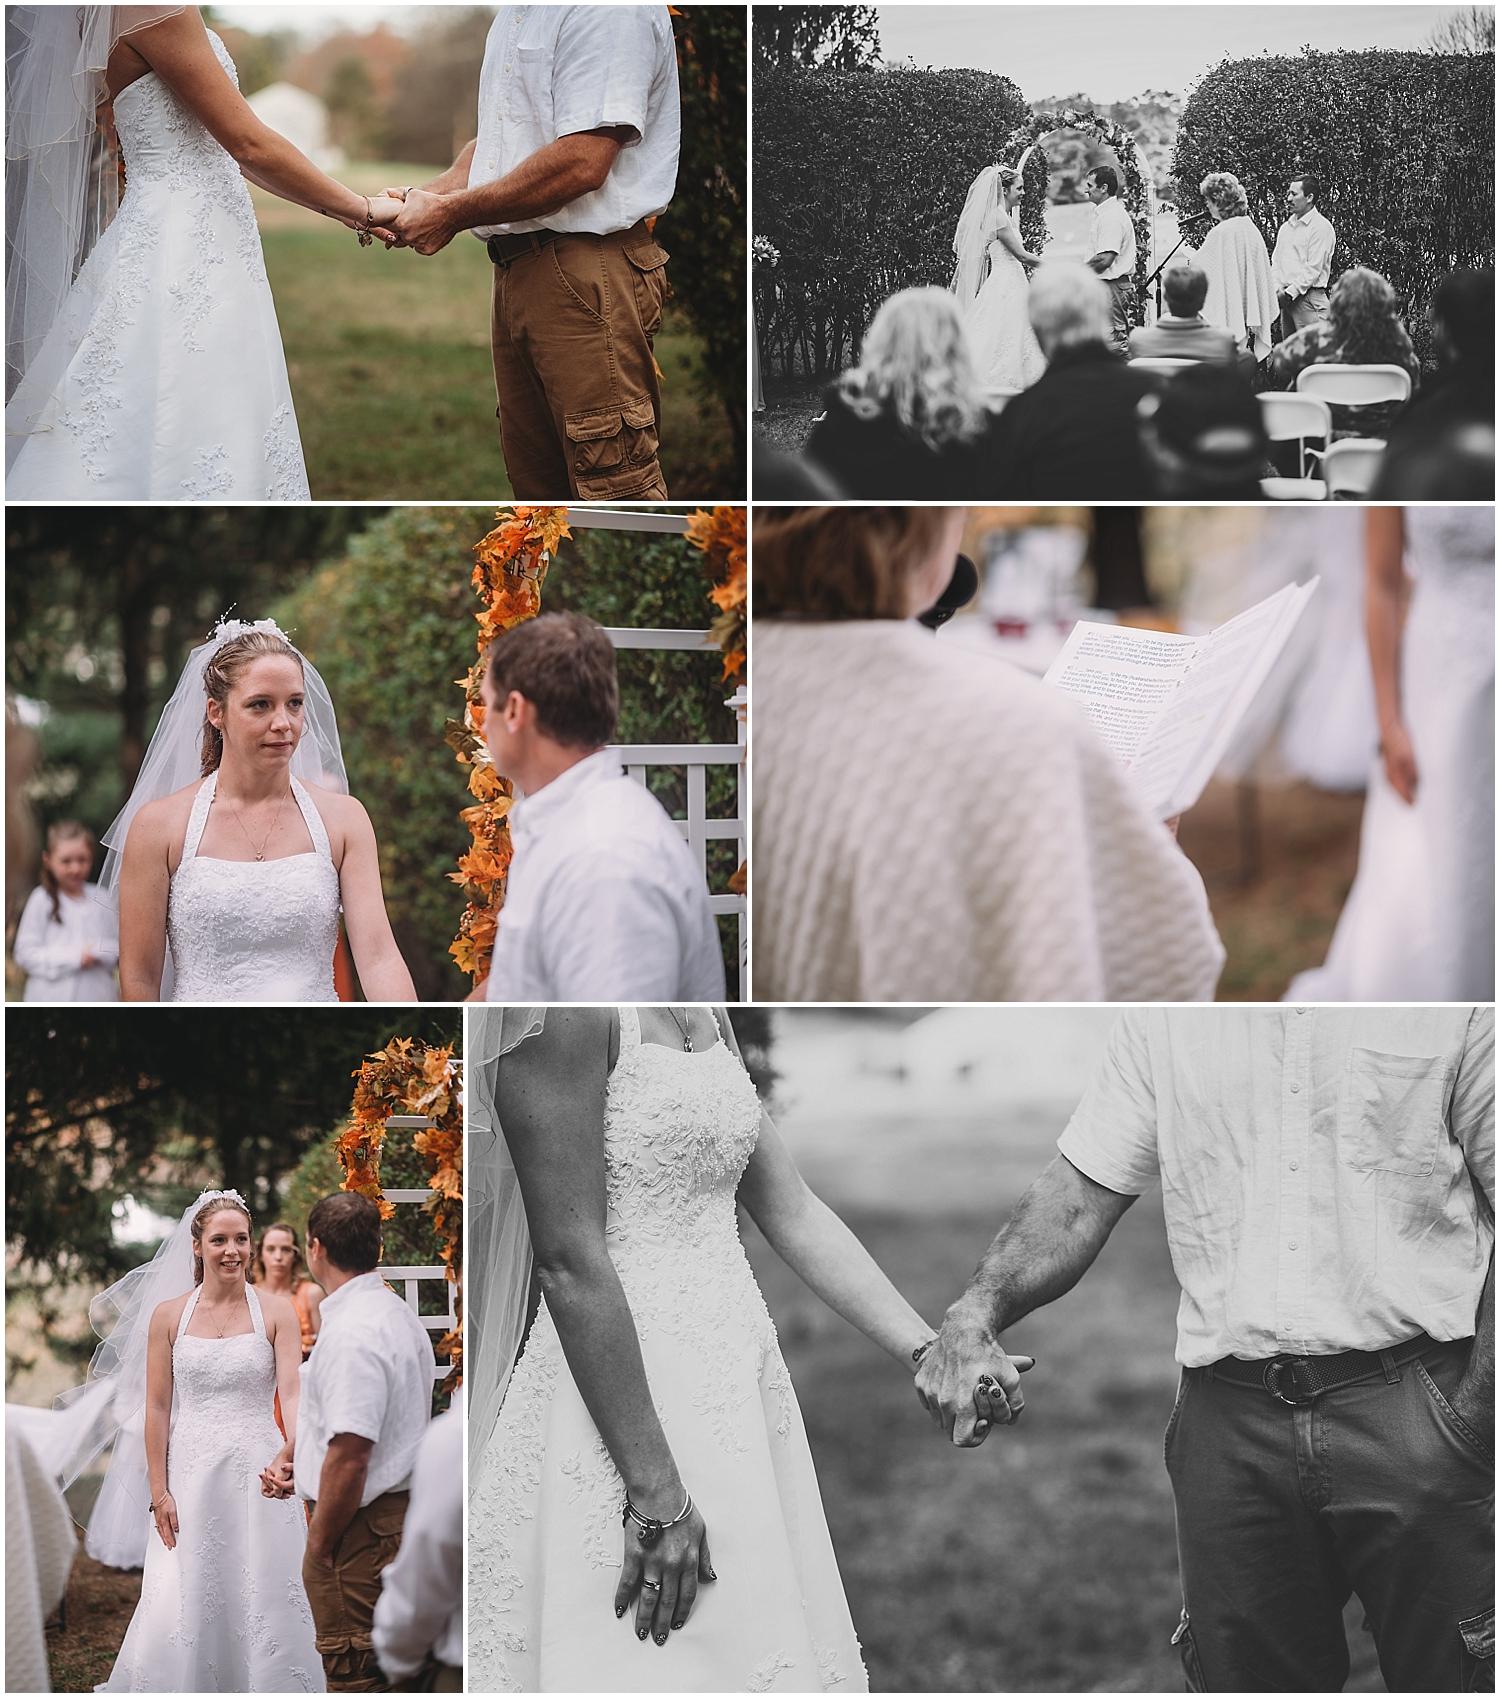 NEPA-Scranton-Dallas-wedding-engagement-photographer-in-Philadelphia-PA-Central-PA_0086.jpg